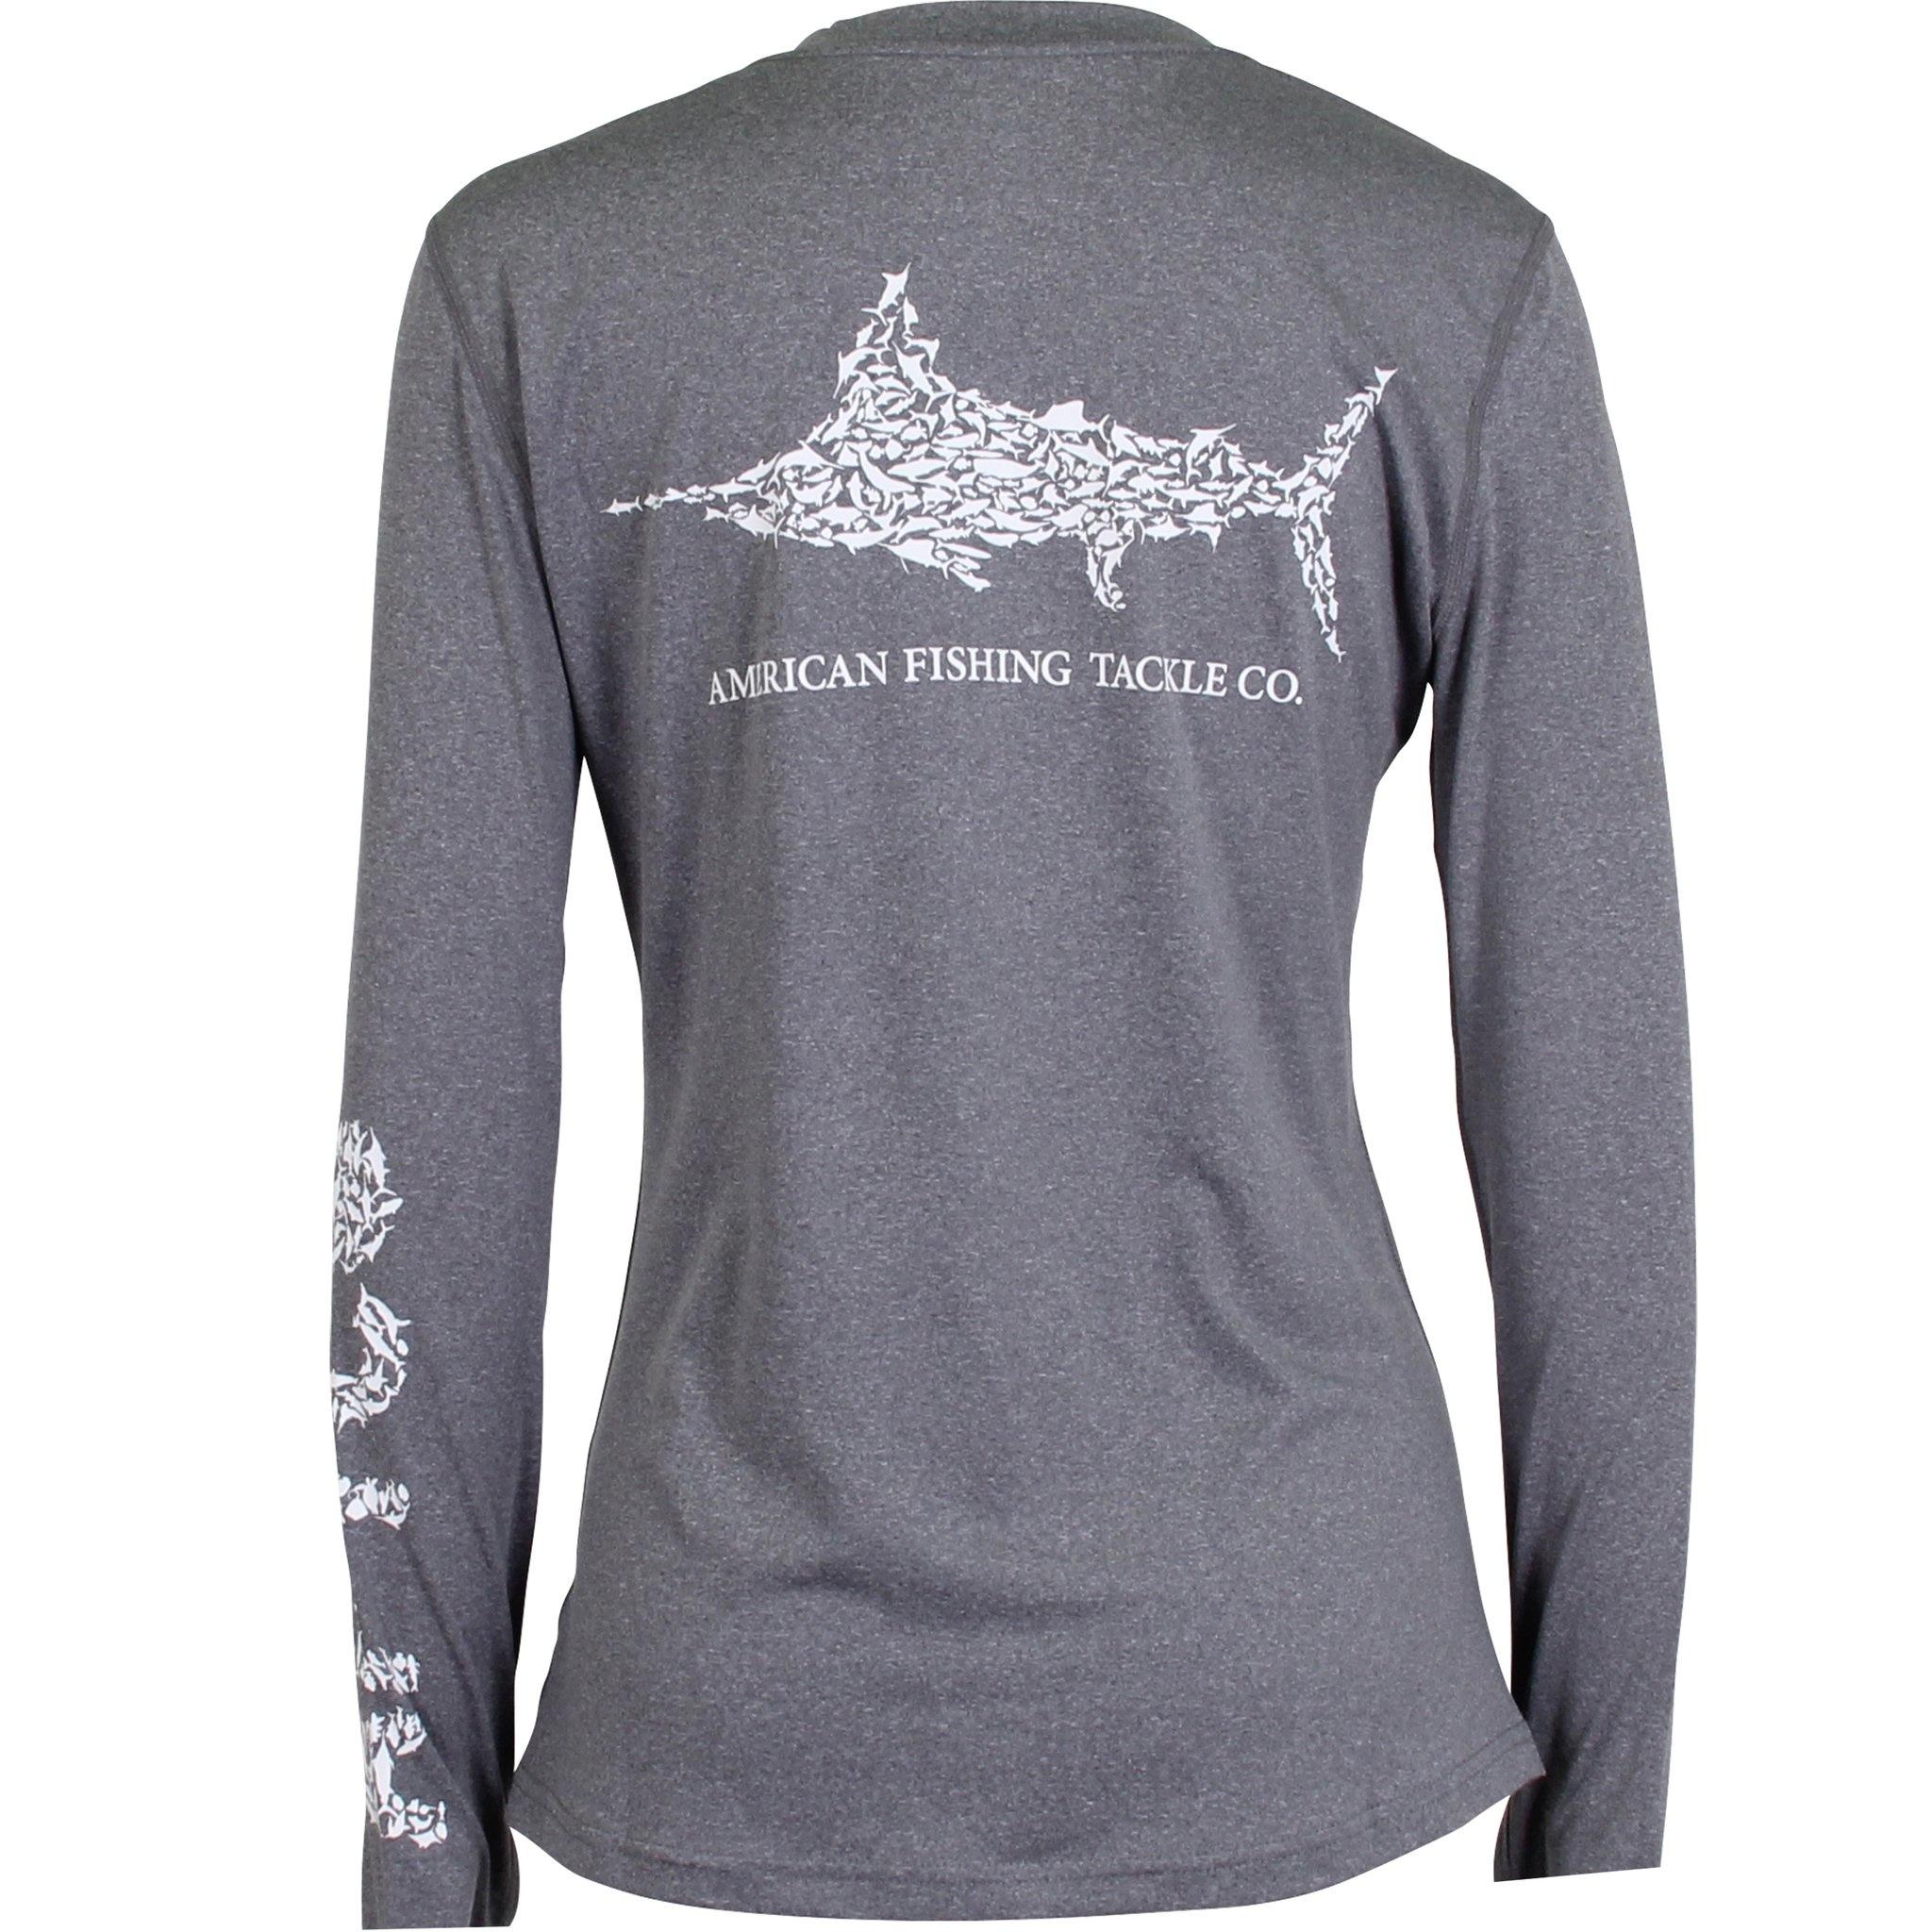 Aftco Women's Jigfish LS Shirt Charcoal Heather